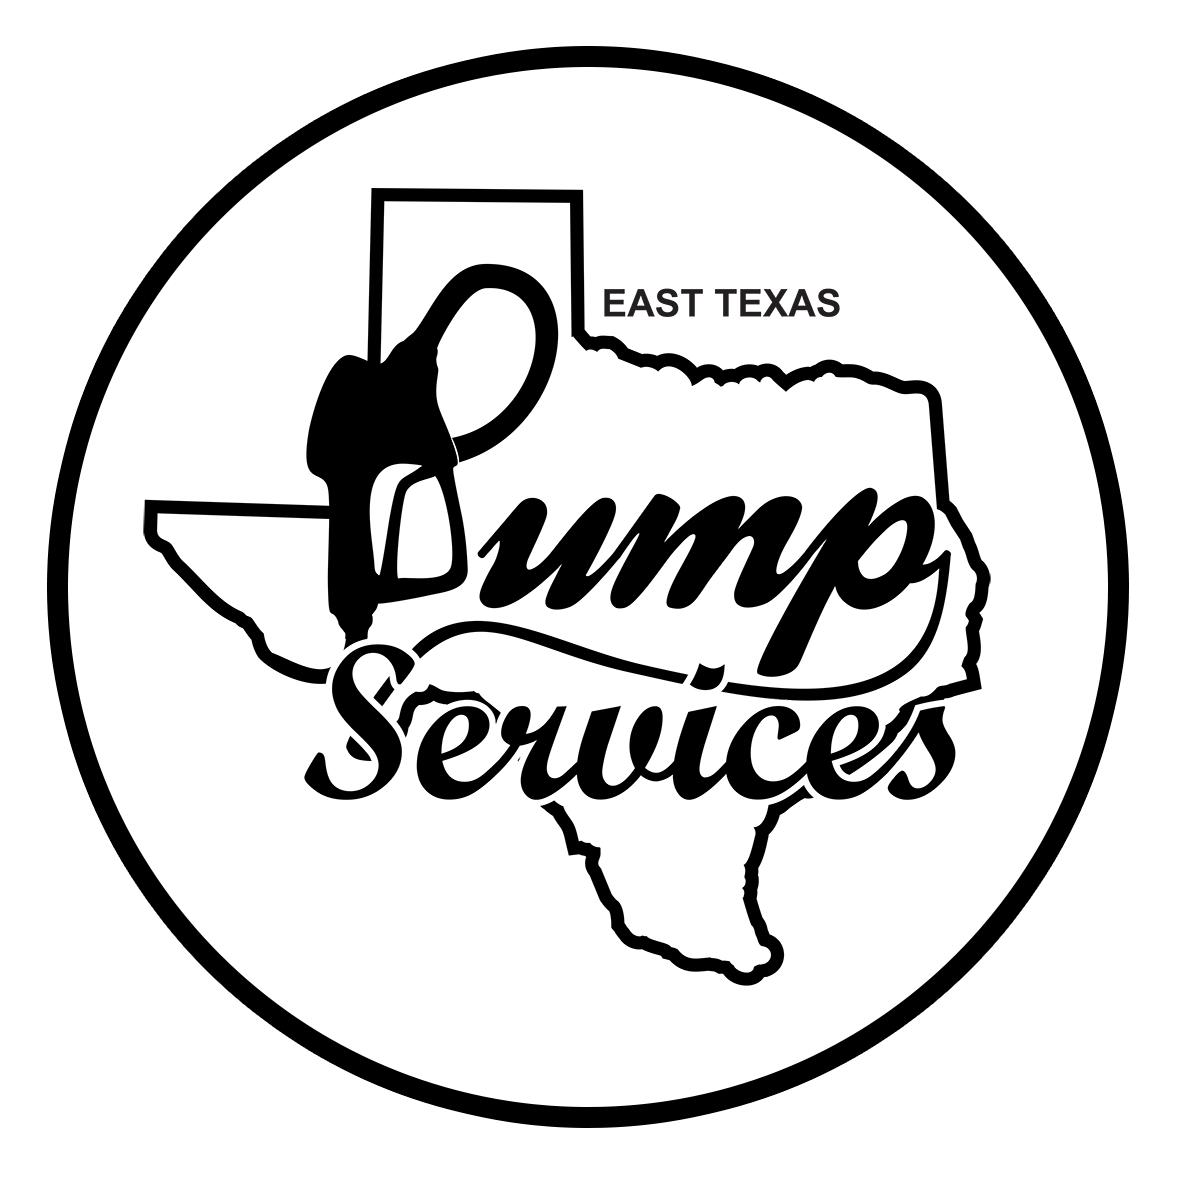 East Texas Pump Service